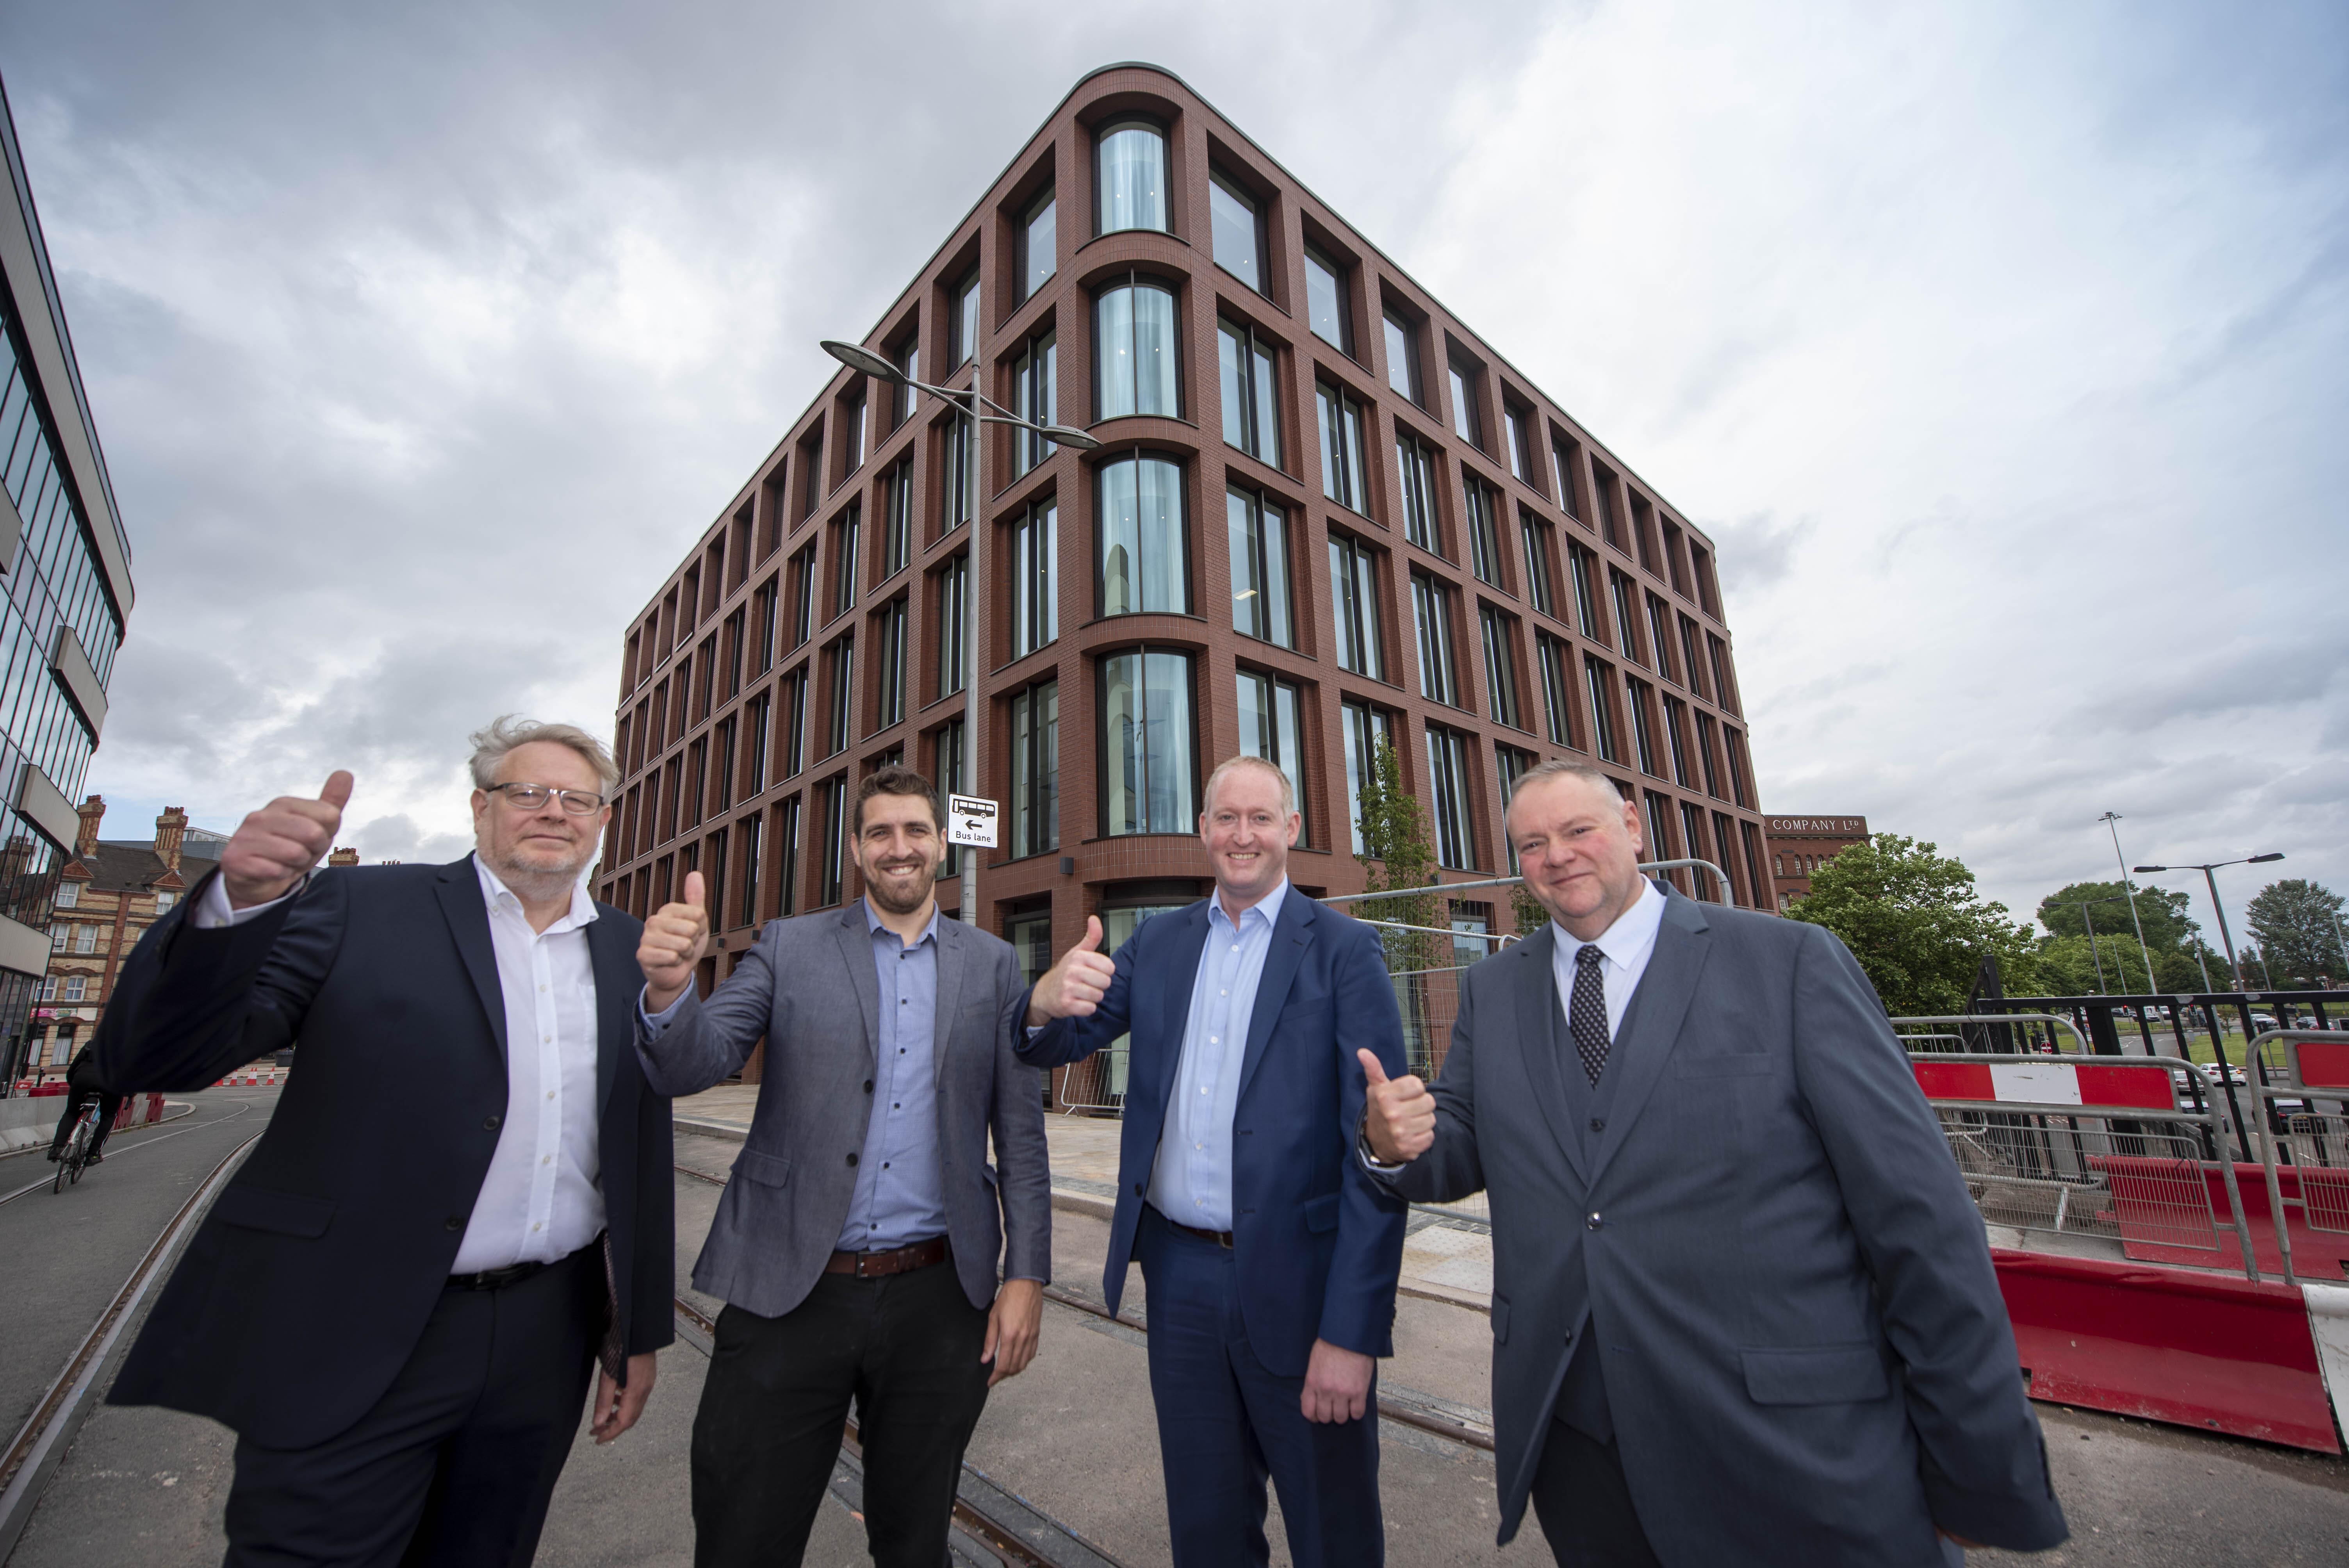 Construction complete on Wolverhampton's i9 development image